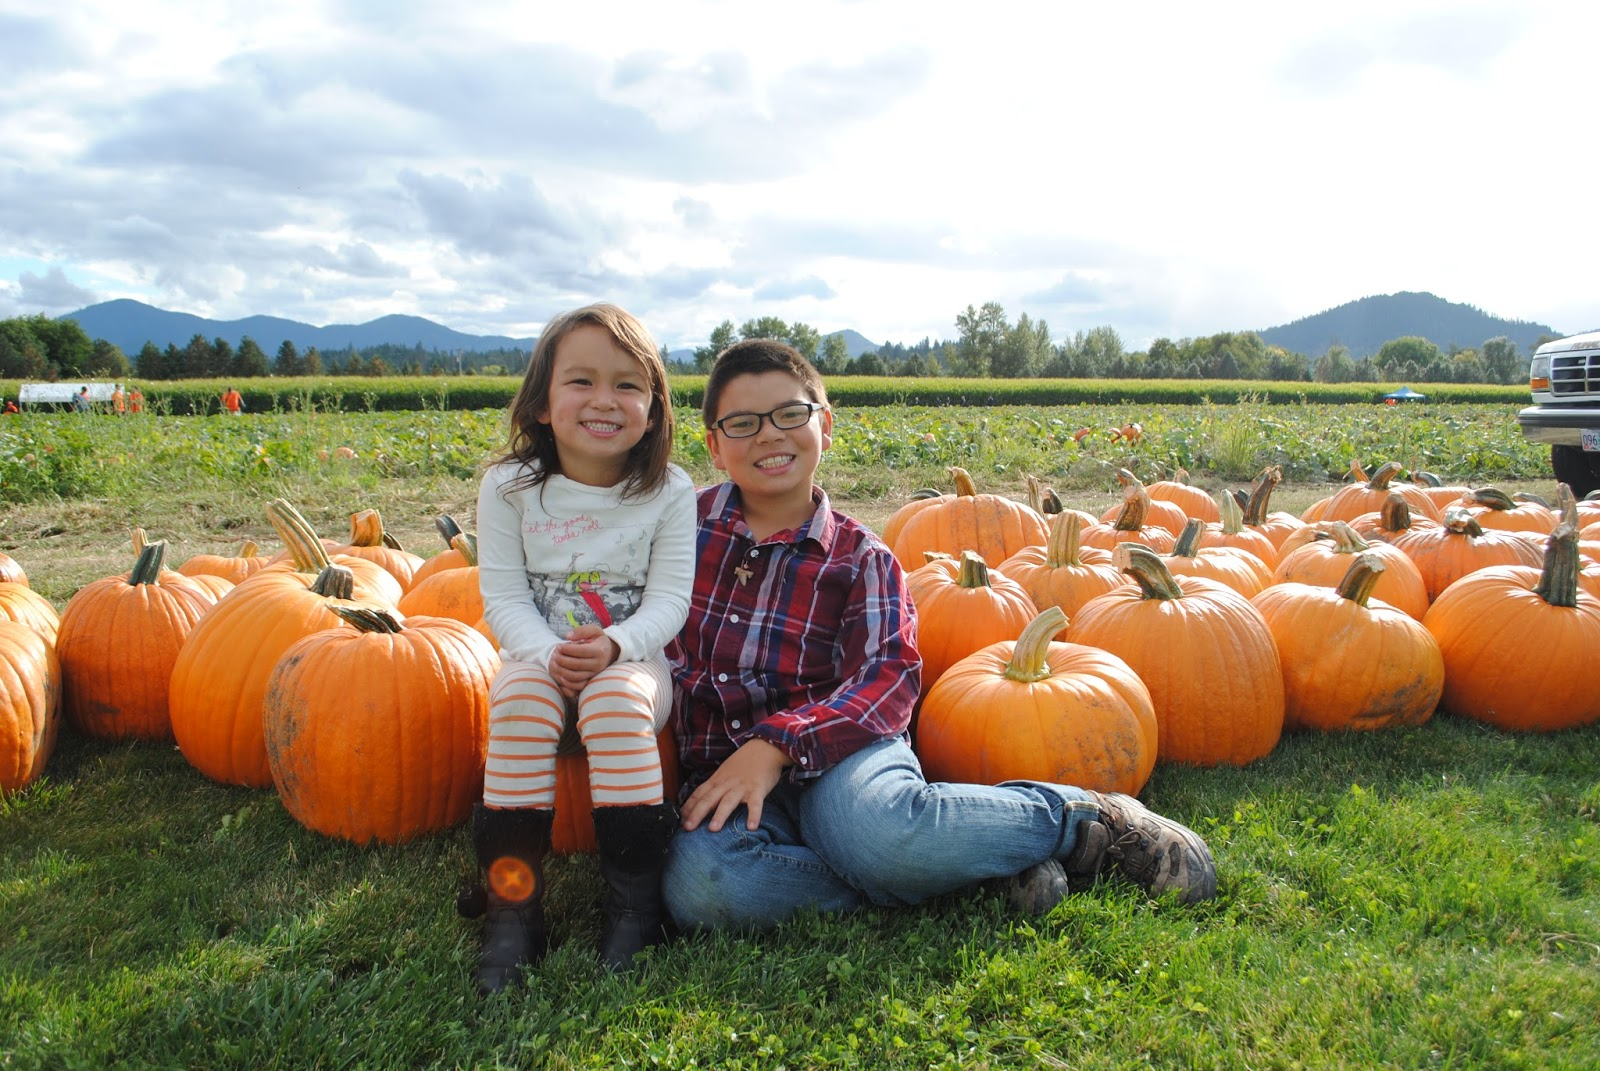 Fort Vannoy Farms Harvest Festival - Grants Pass, Oregon - Josephine County - Rogue Valley - Southern Oregon - Fall - Autumn - Pumpkin Patch - Corn Maze - Hayrides (185).JPG